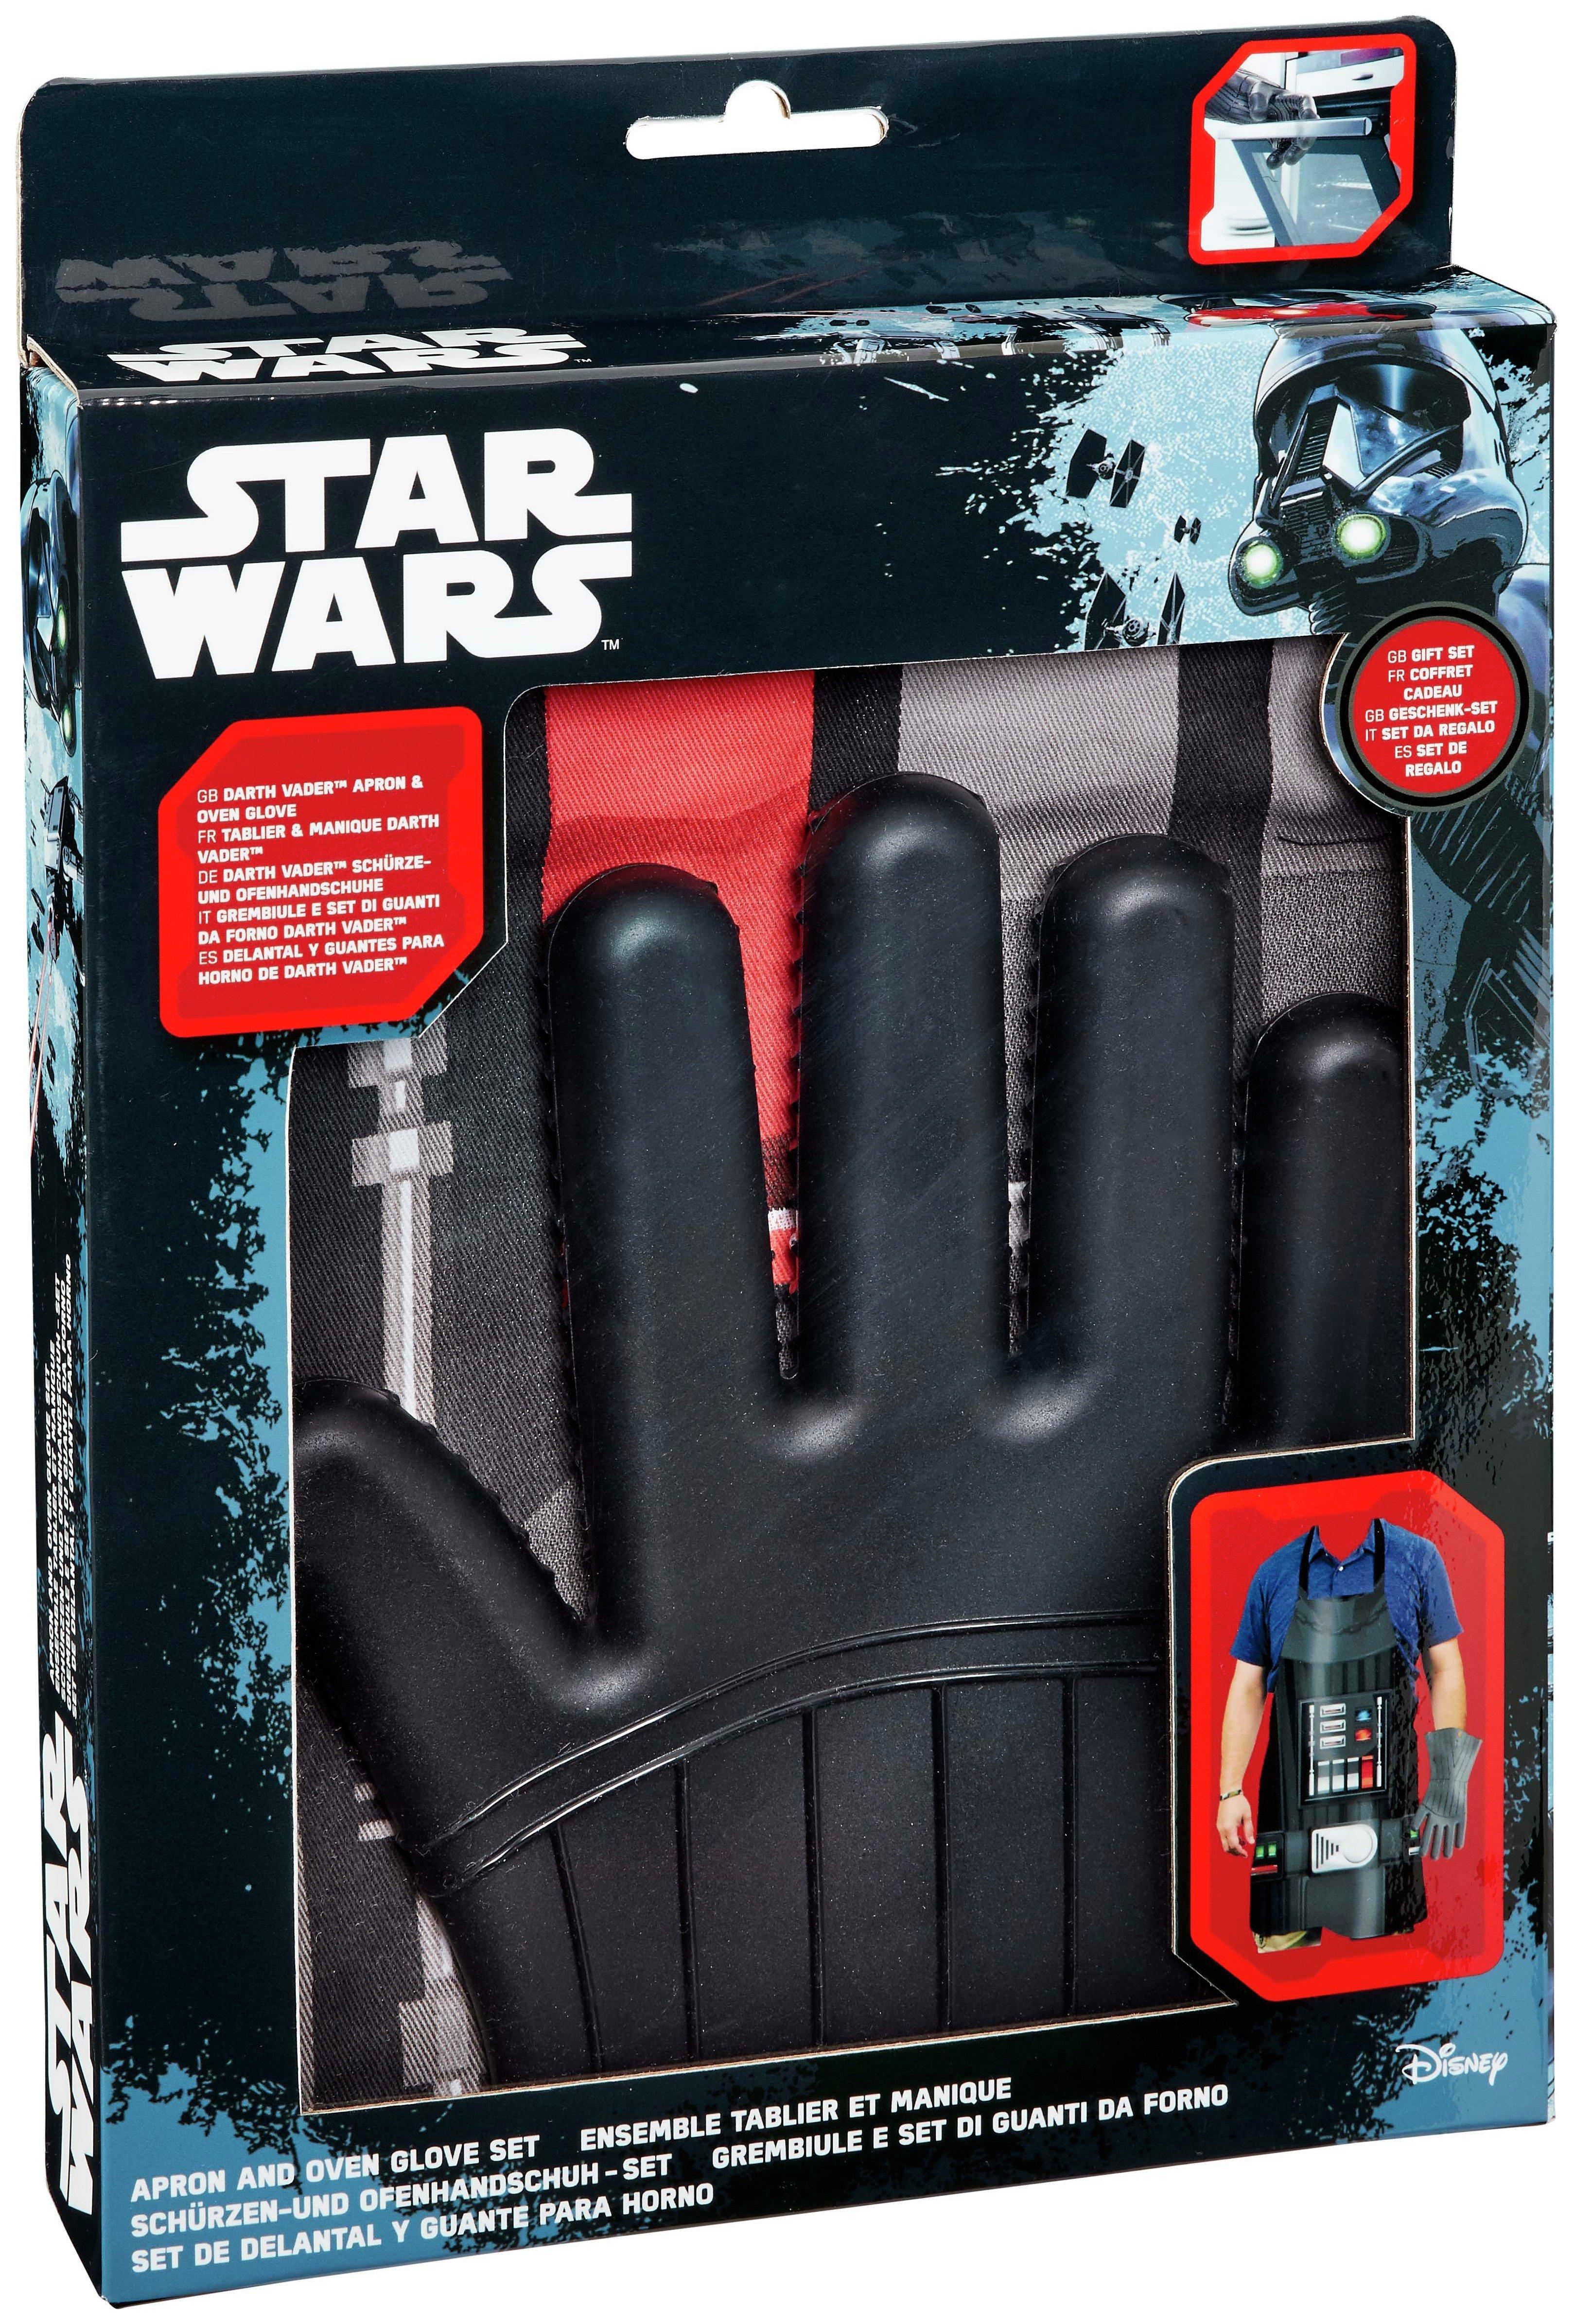 Image of Star Wars Darth Vader Apron & Oven Glove